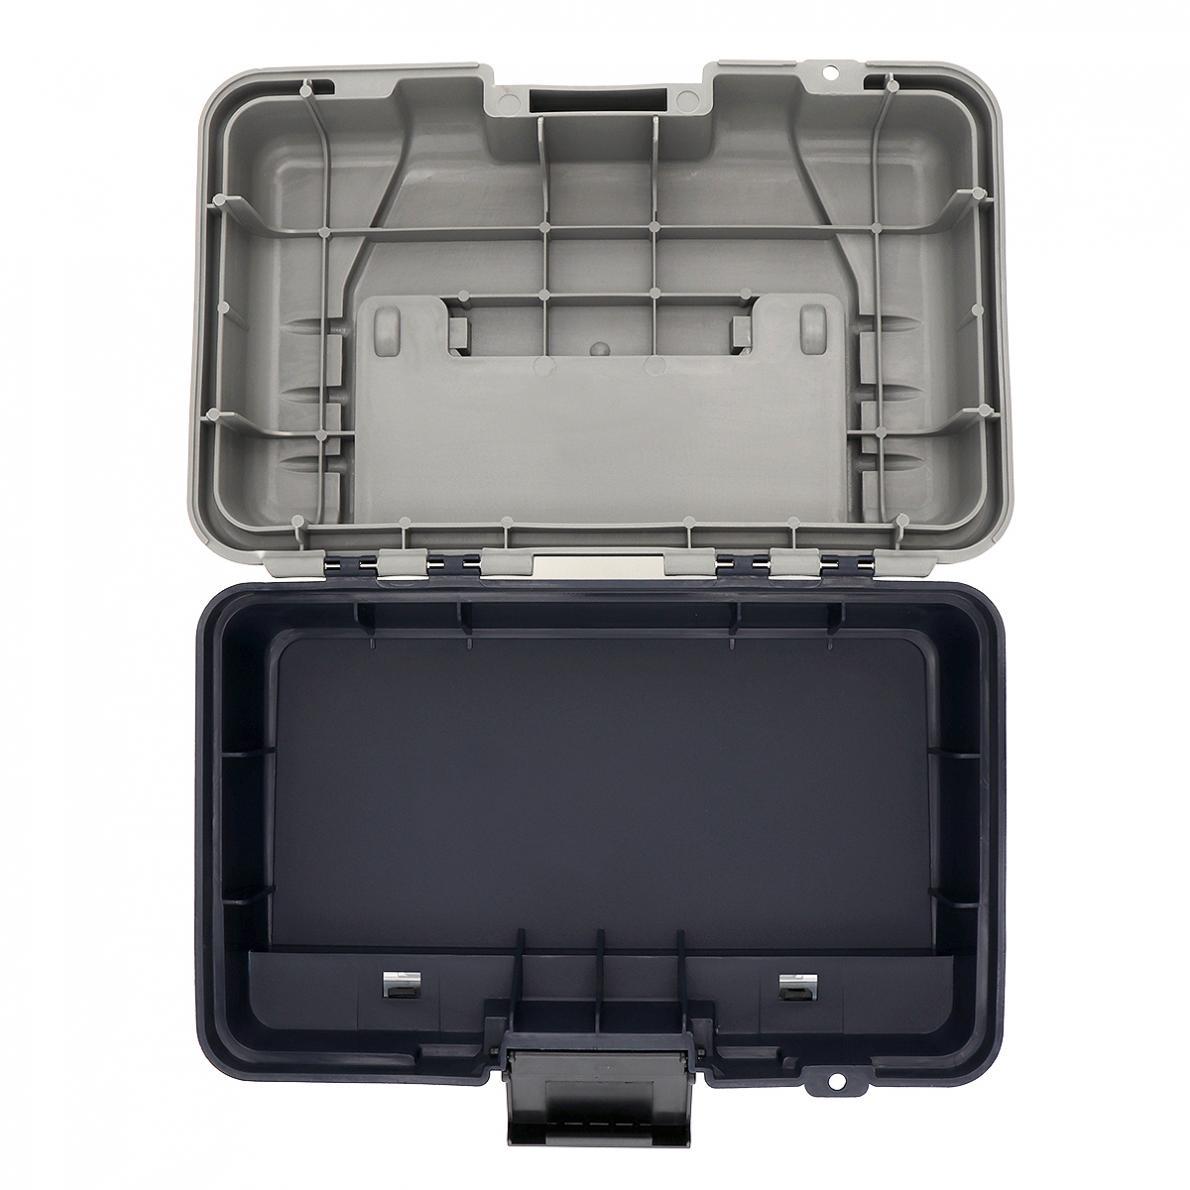 mar caixa de equipamento pesca caixa 02